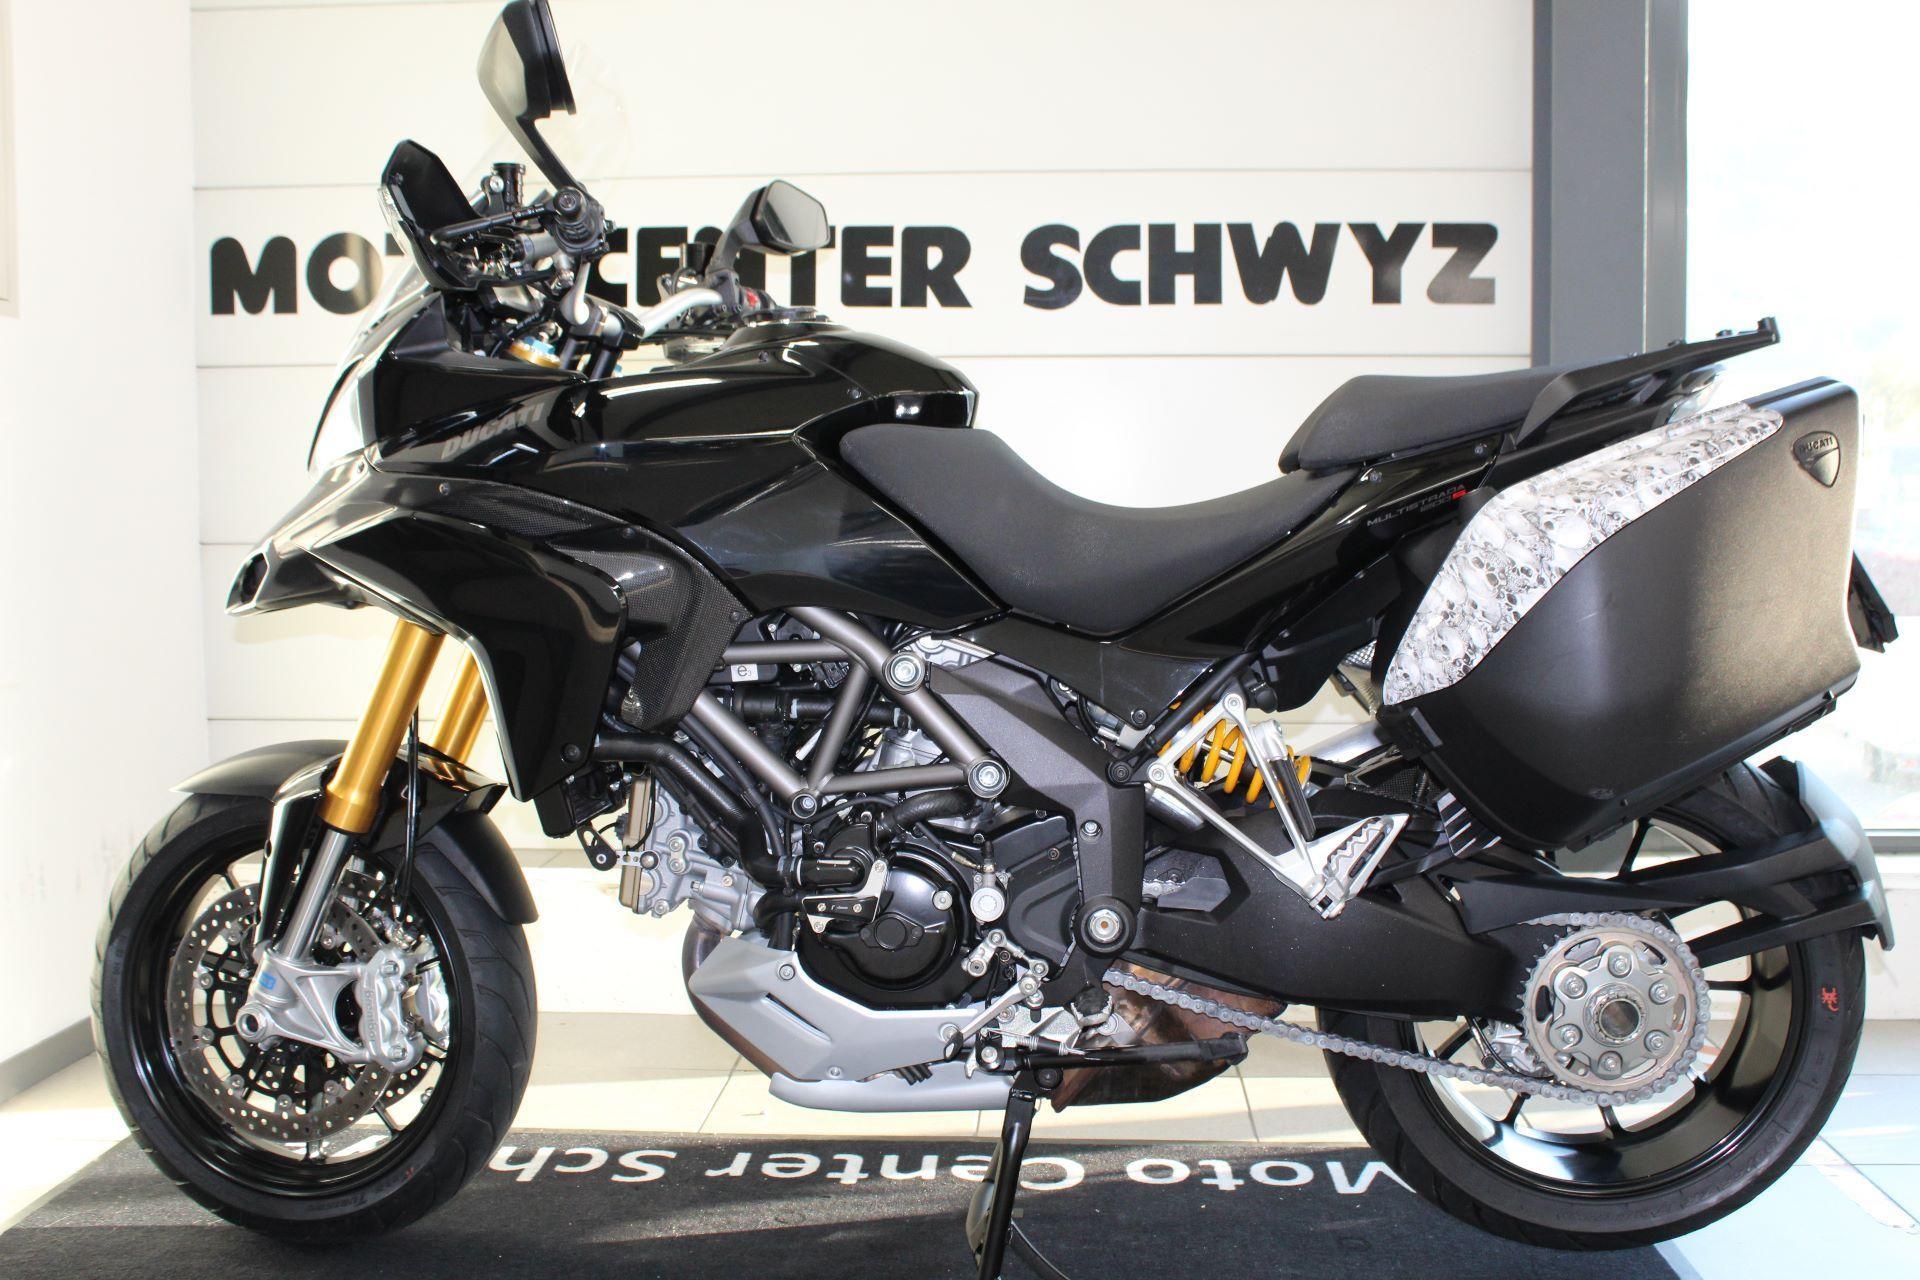 moto occasions acheter ducati 1200 multistrada s abs moto center schwyz ag seewen schwyz. Black Bedroom Furniture Sets. Home Design Ideas